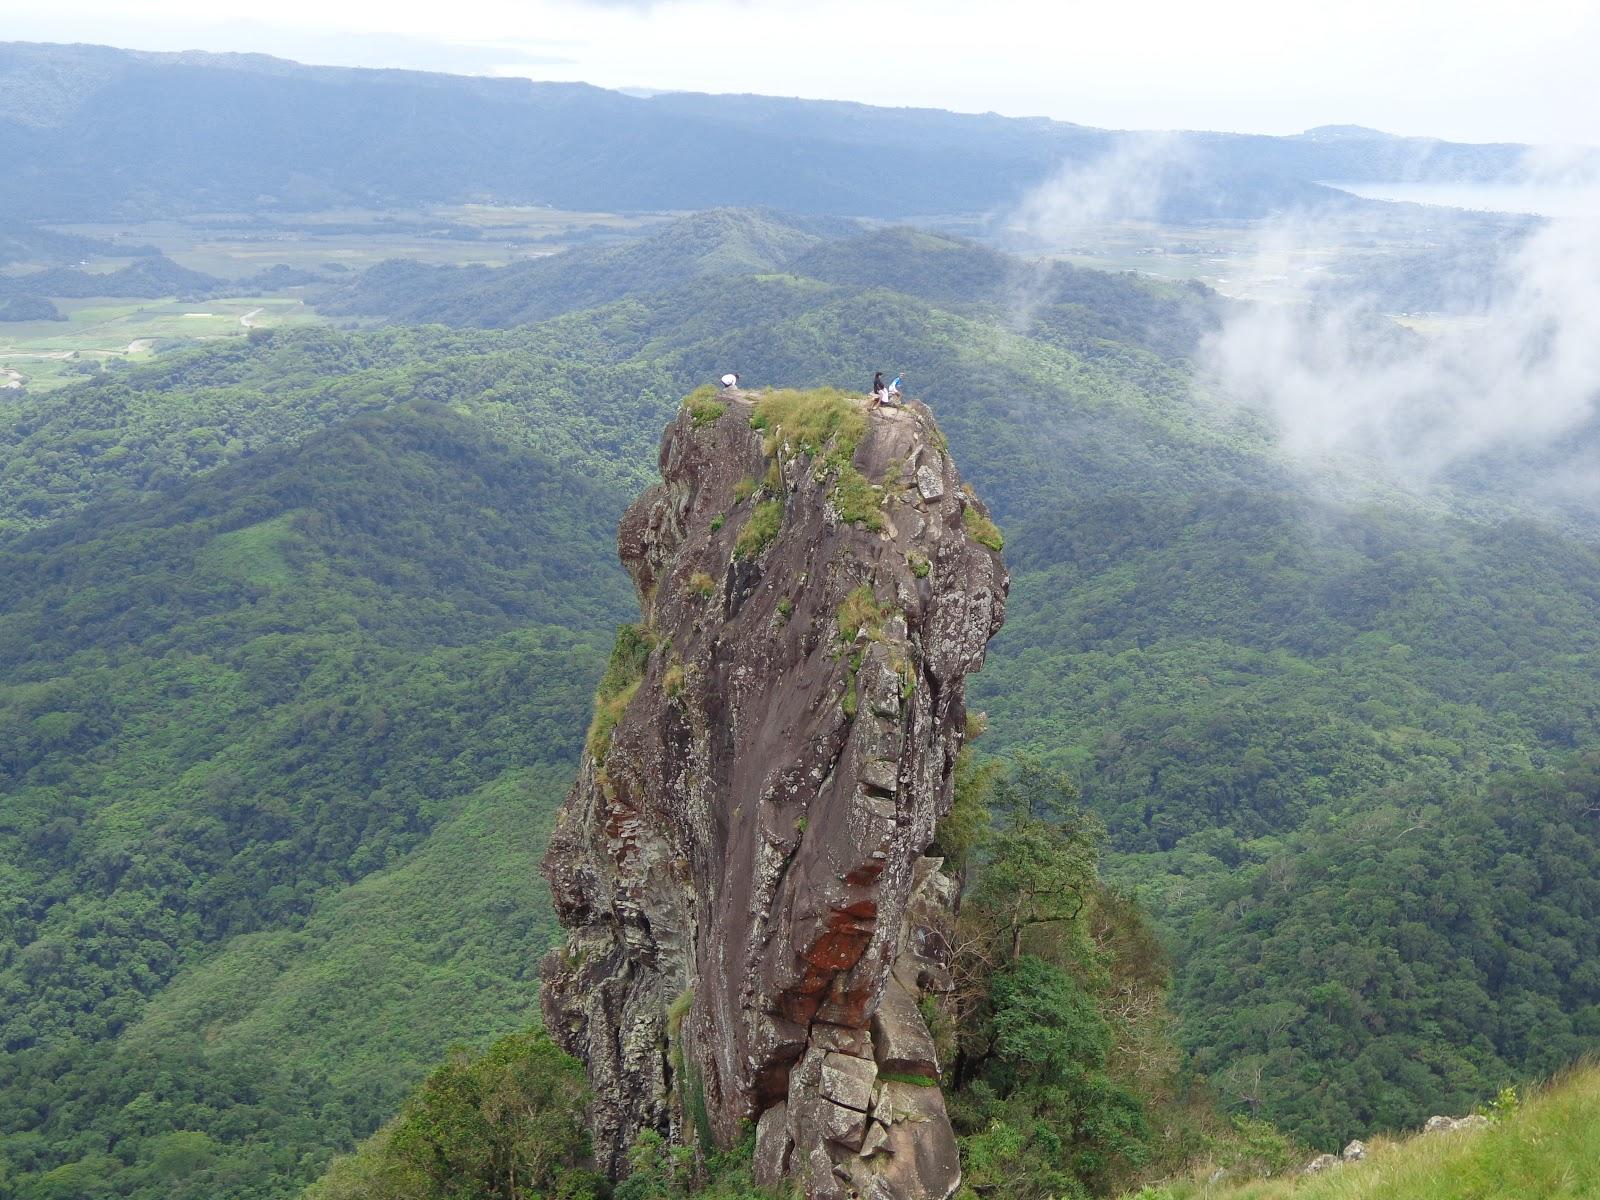 Conquering Mountains Mt Pico De Loro The Wandering Juan